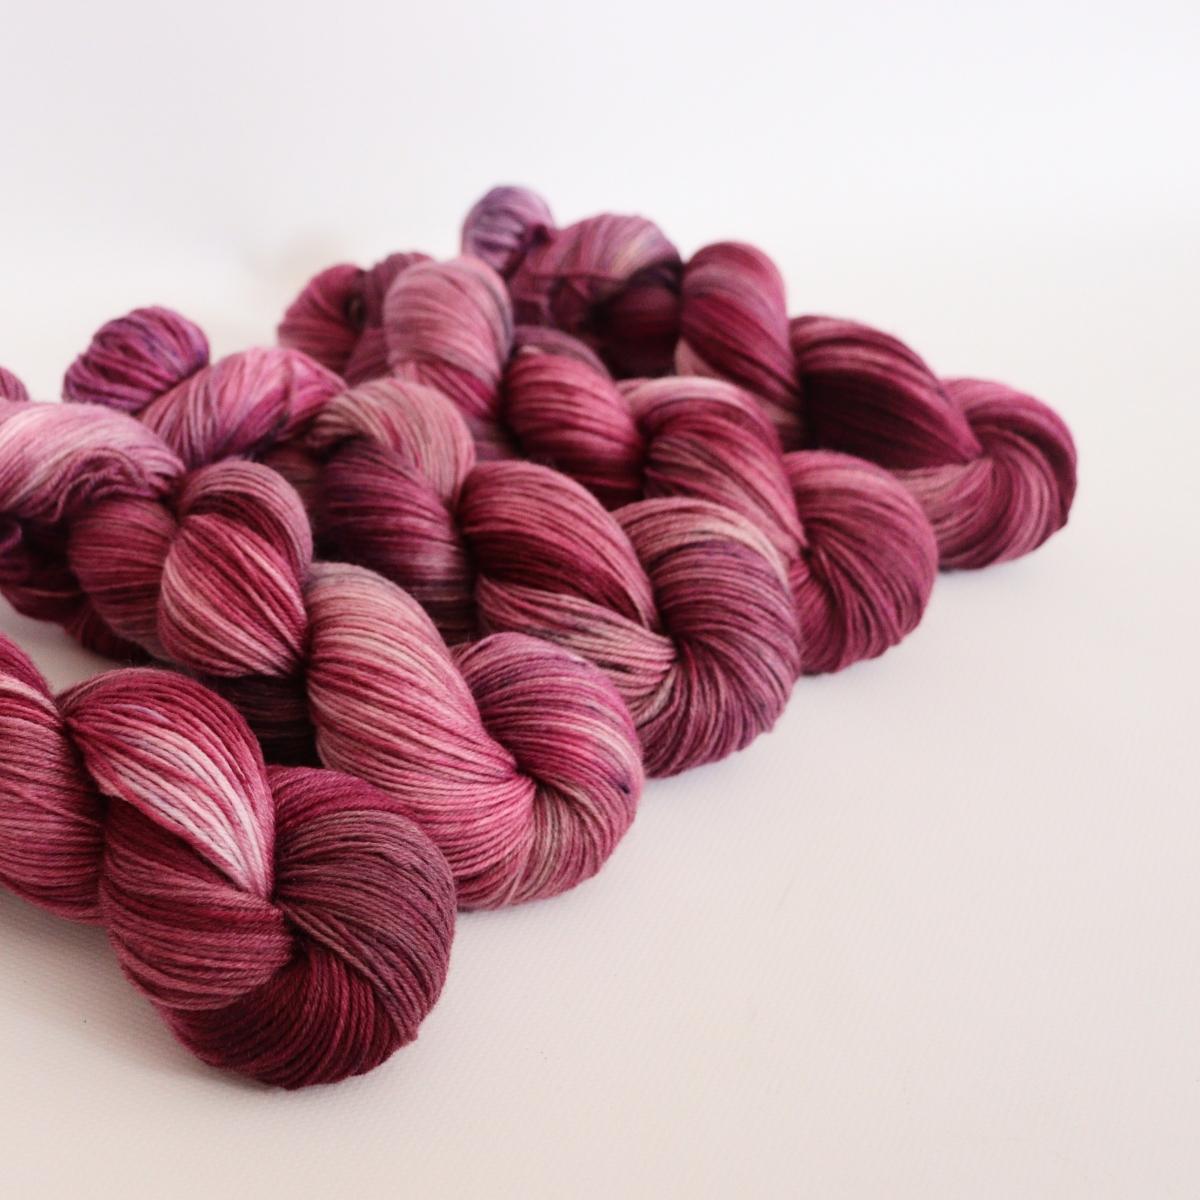 woodico.pro hand dyed yarn 057 1 1200x1200 - Hand dyed yarn / 057